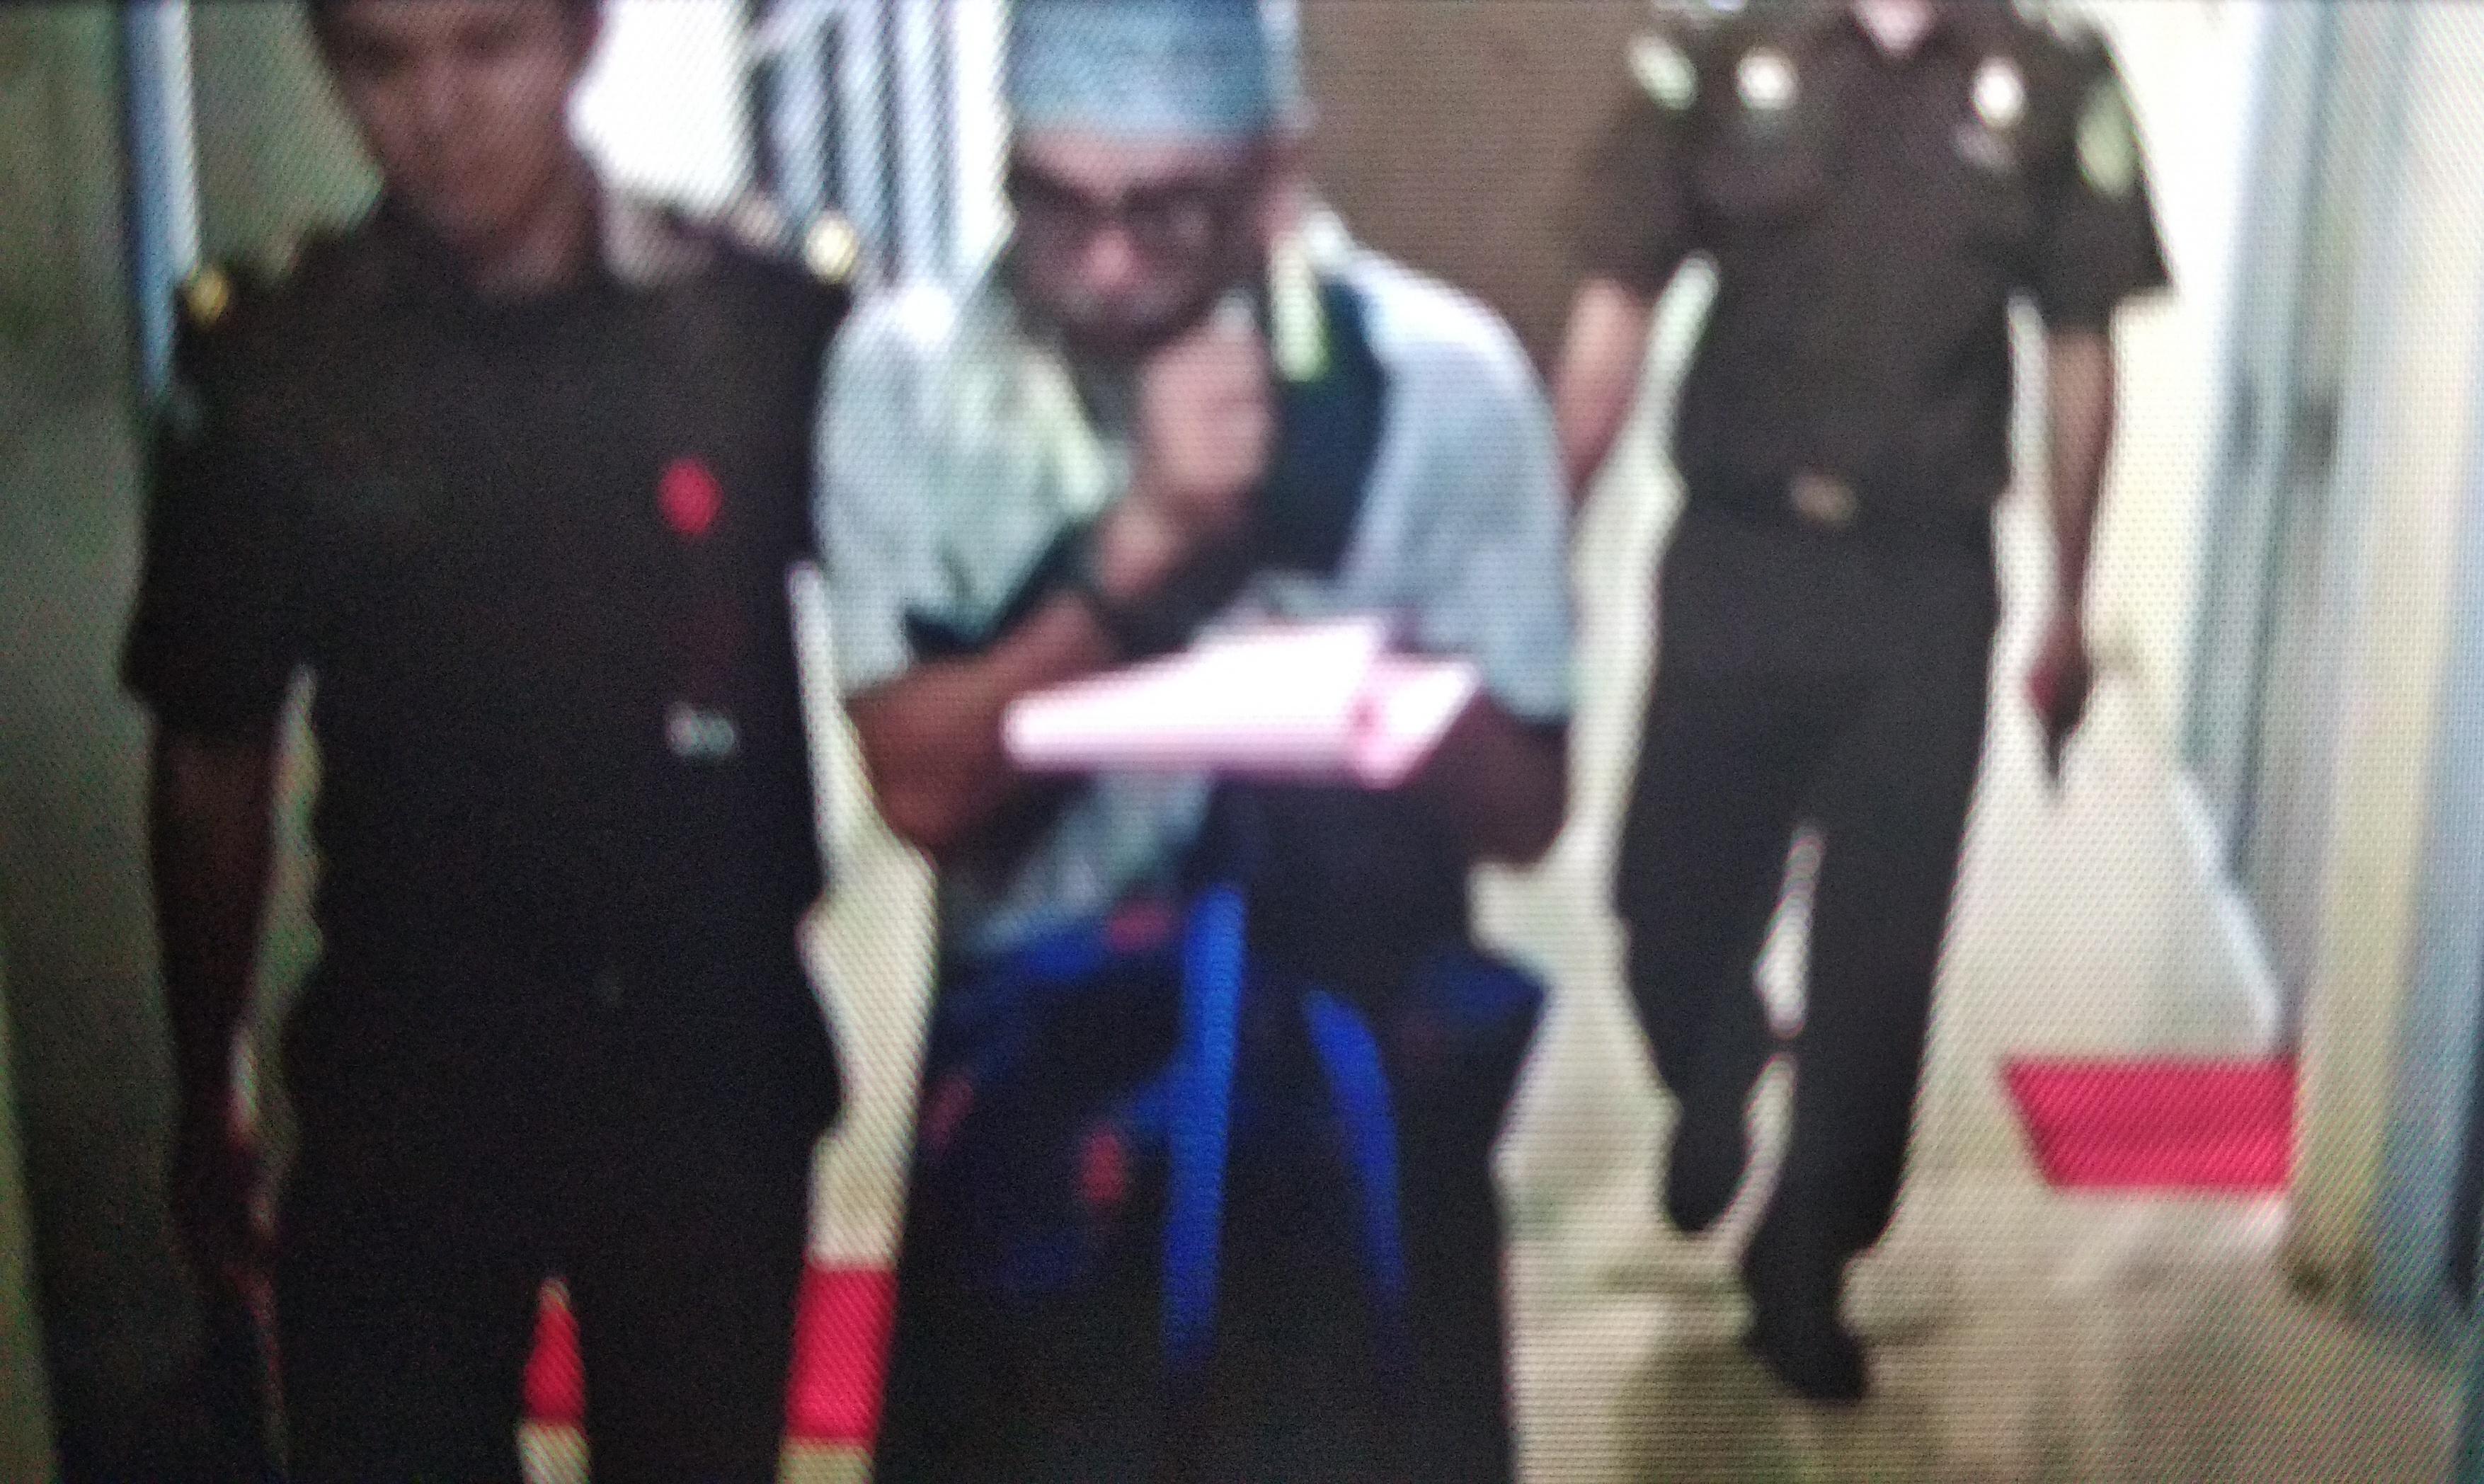 Berkas Nasrun Dj Pembunuh Supartini Lengkap, Kejari Segera Limpahkan ke Pengadilan